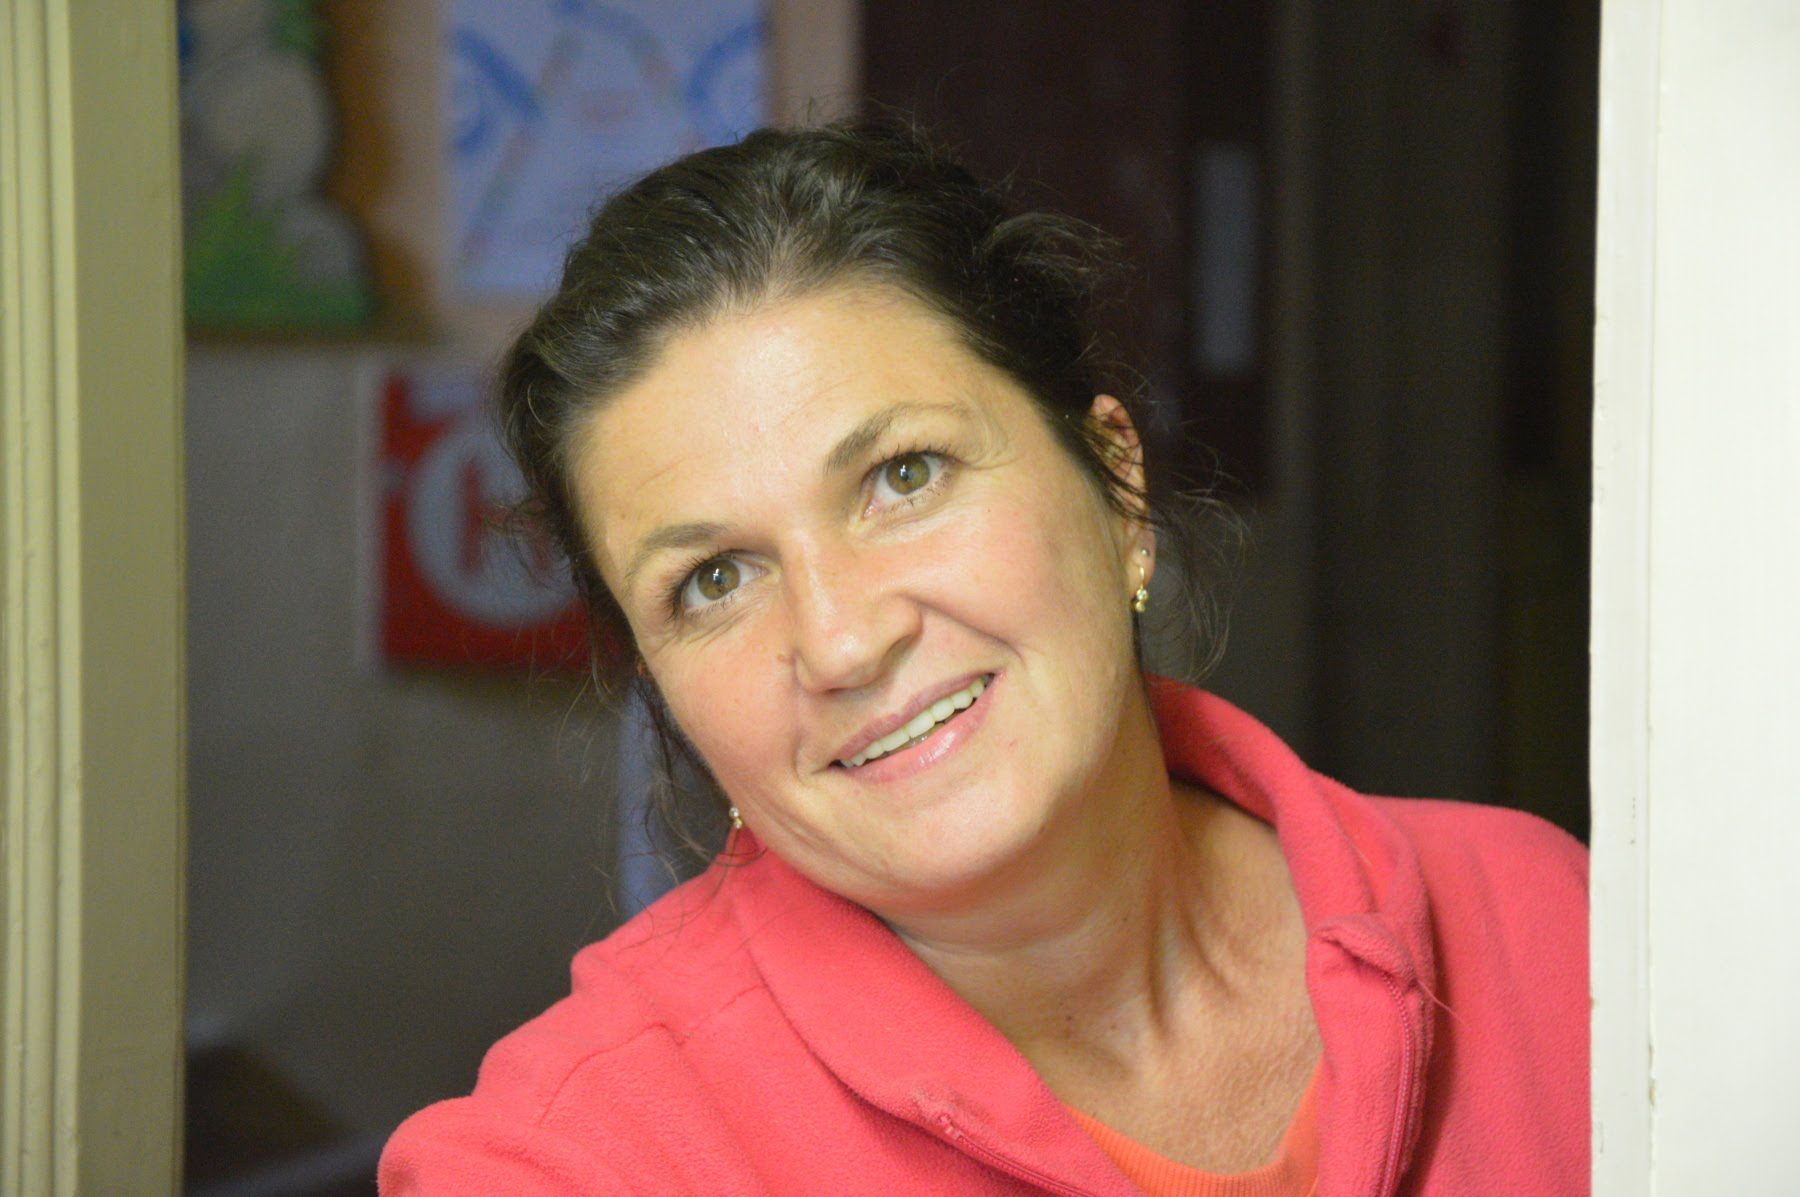 Lucie francova